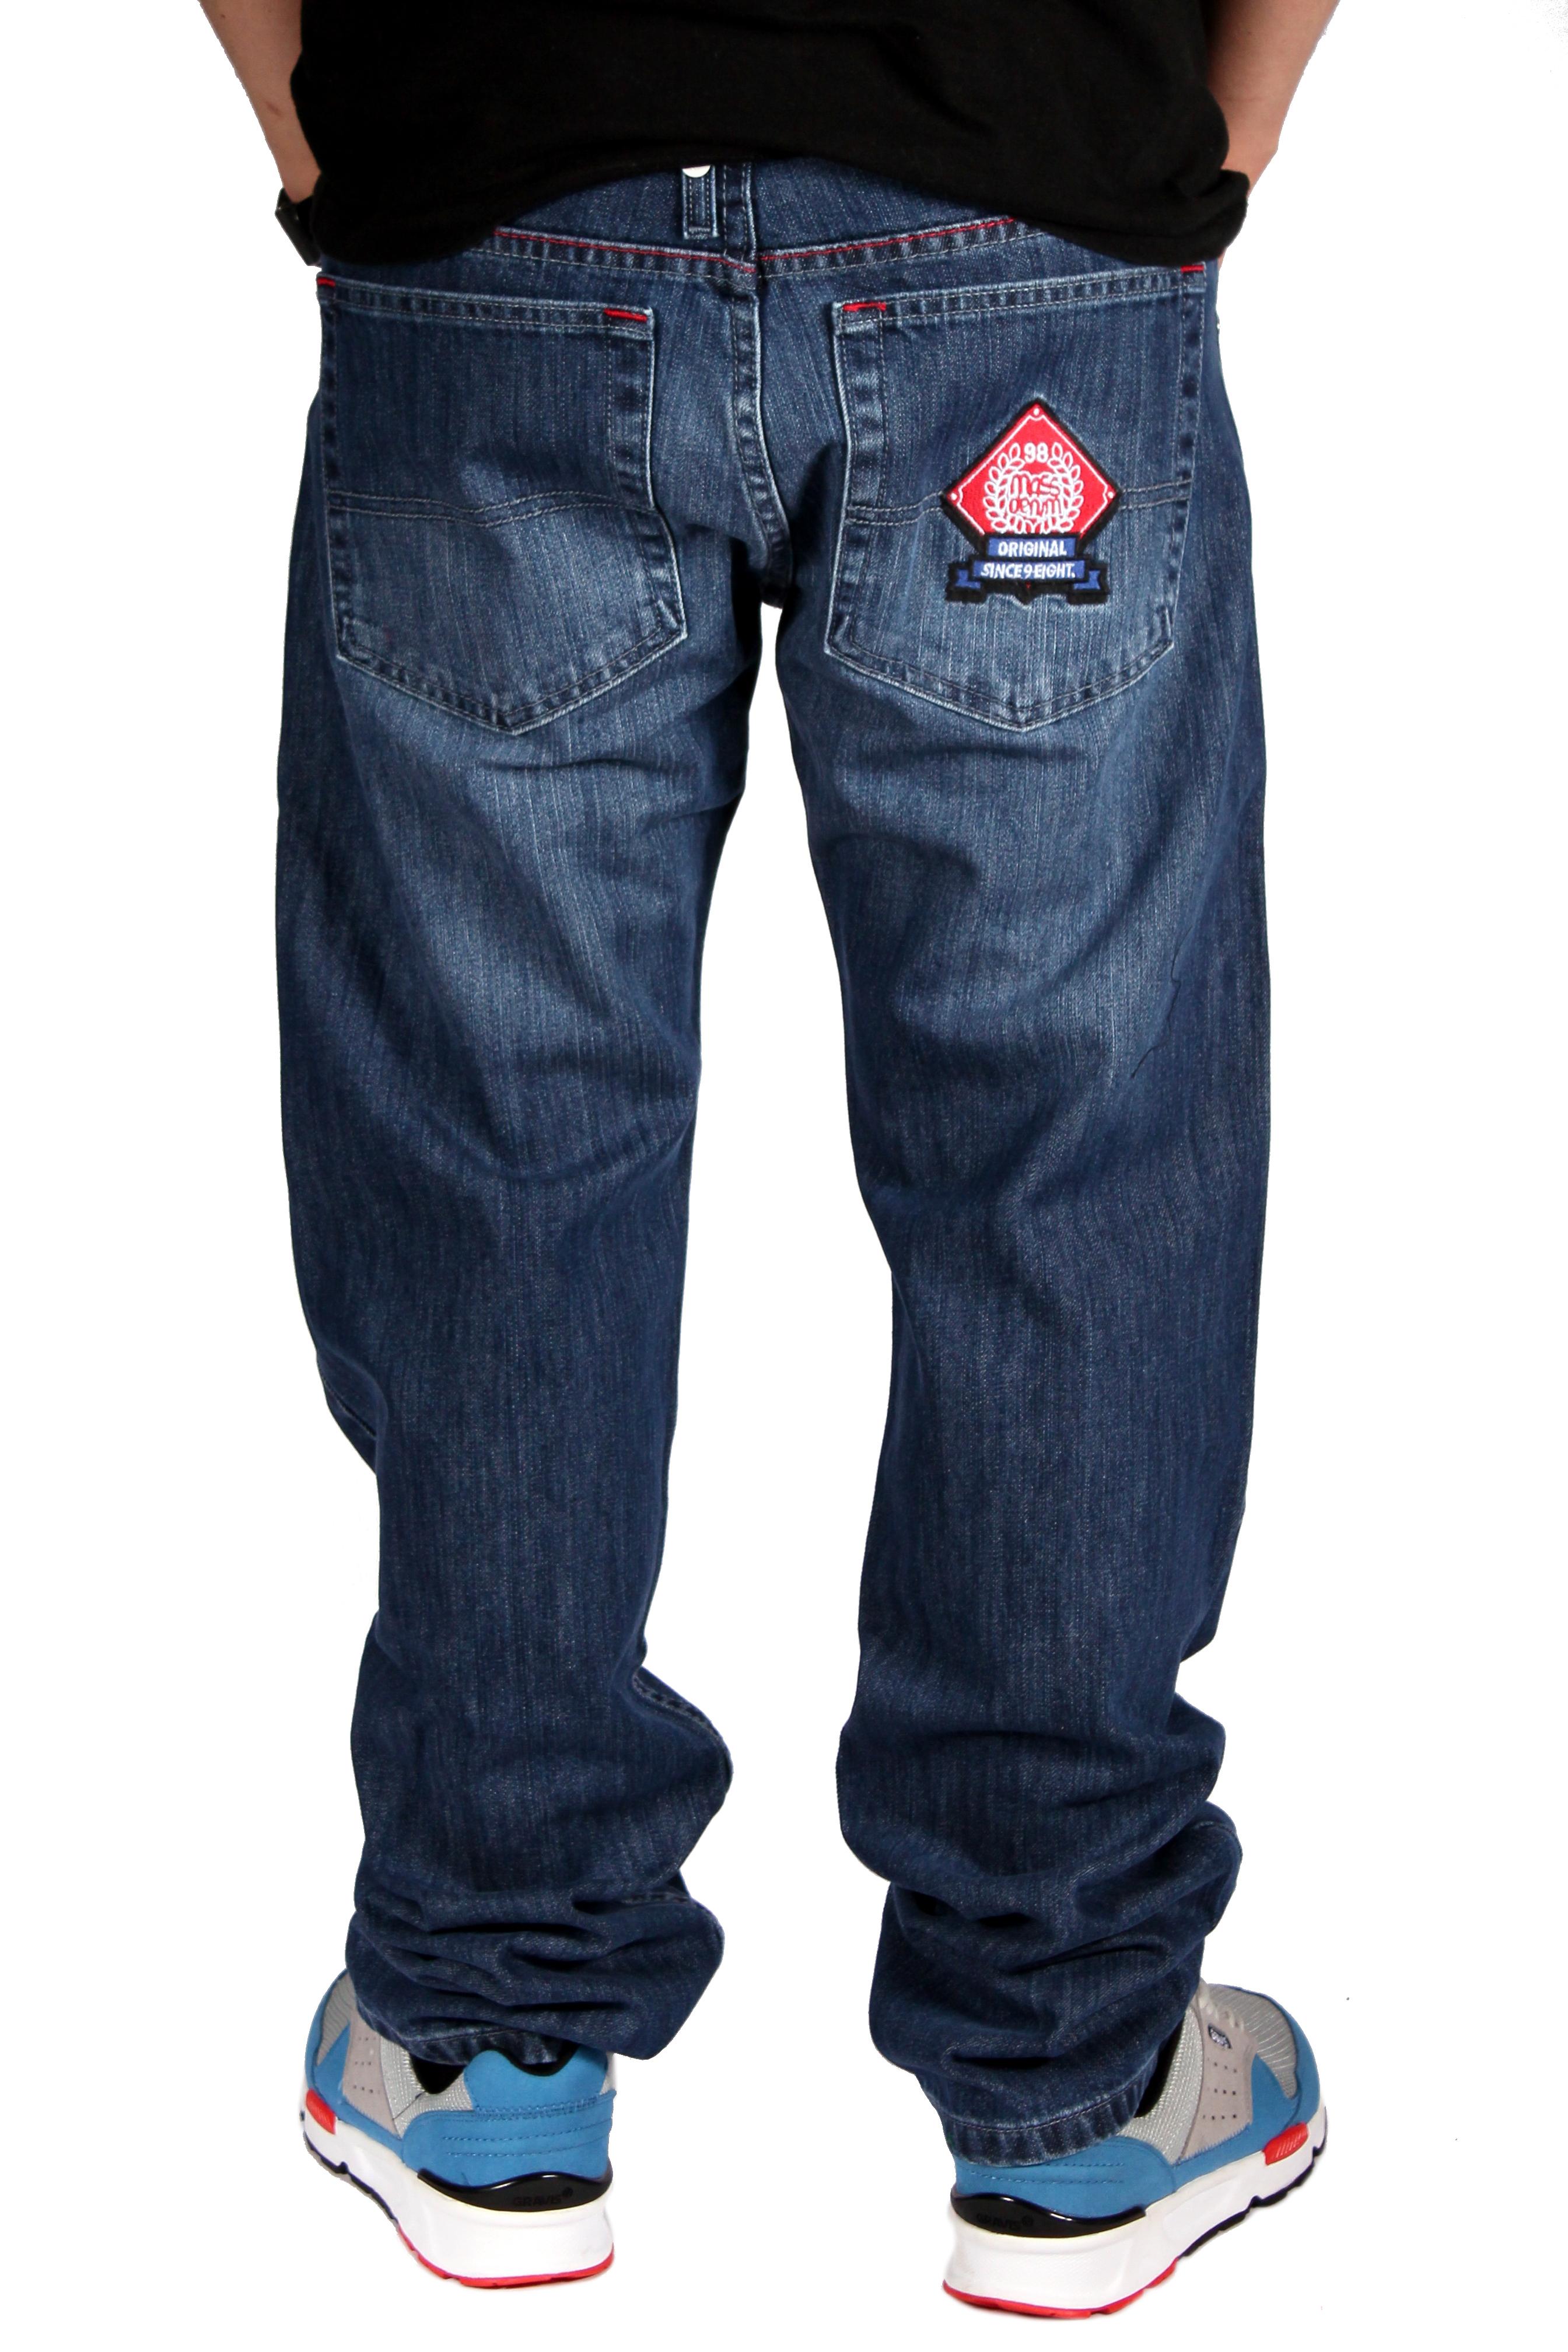 Spodnie Mass Denim Jeans Ambition (Blue)